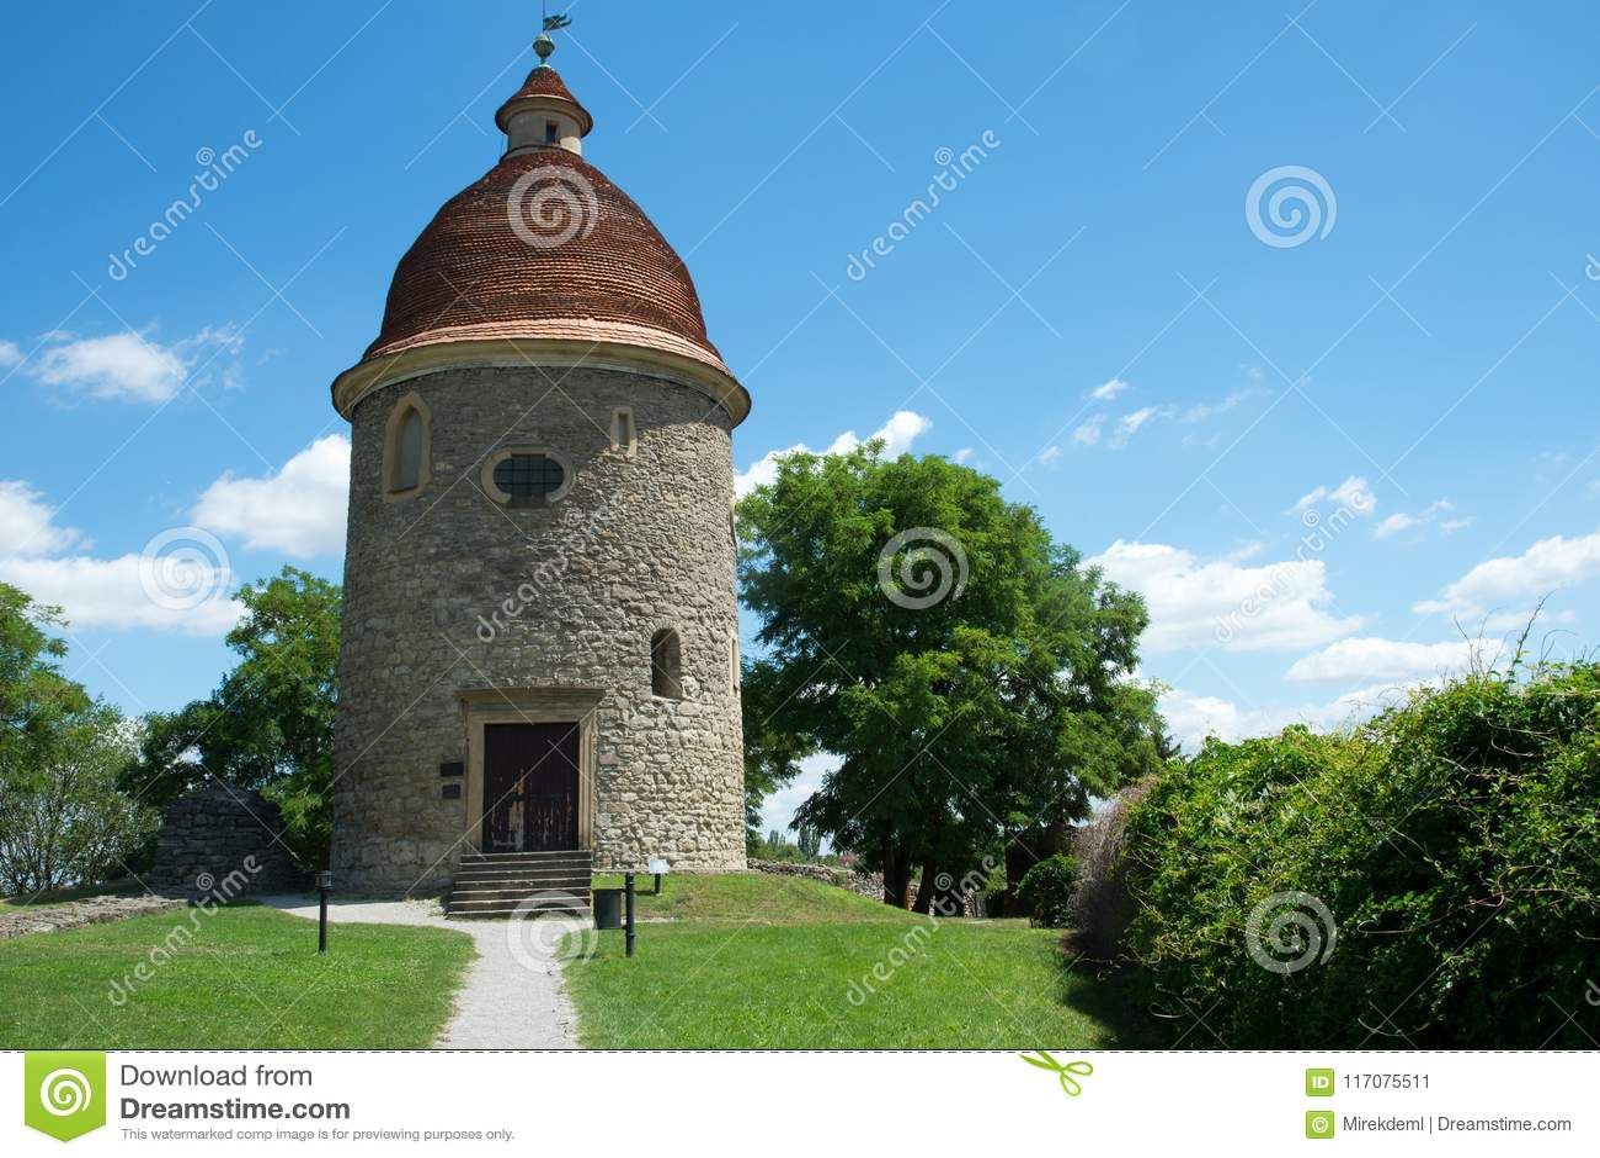 Rotunda in the Skalica, Slovakia